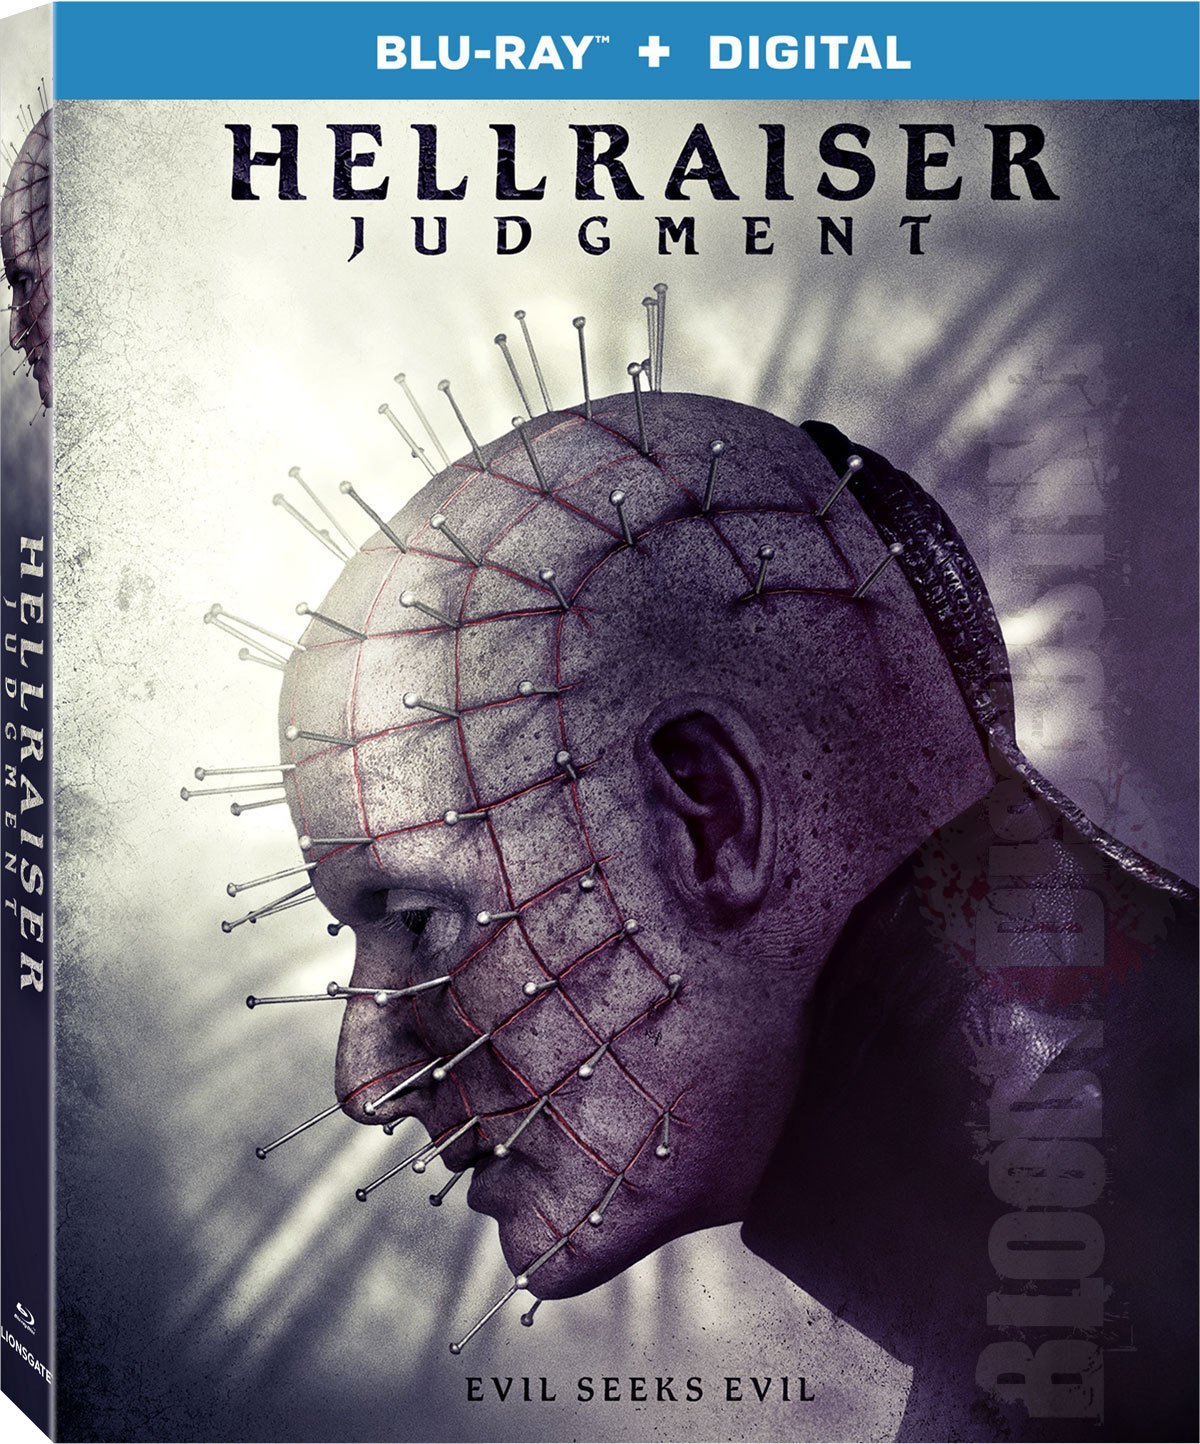 Hellraiser Judgment BD 3D watermarked